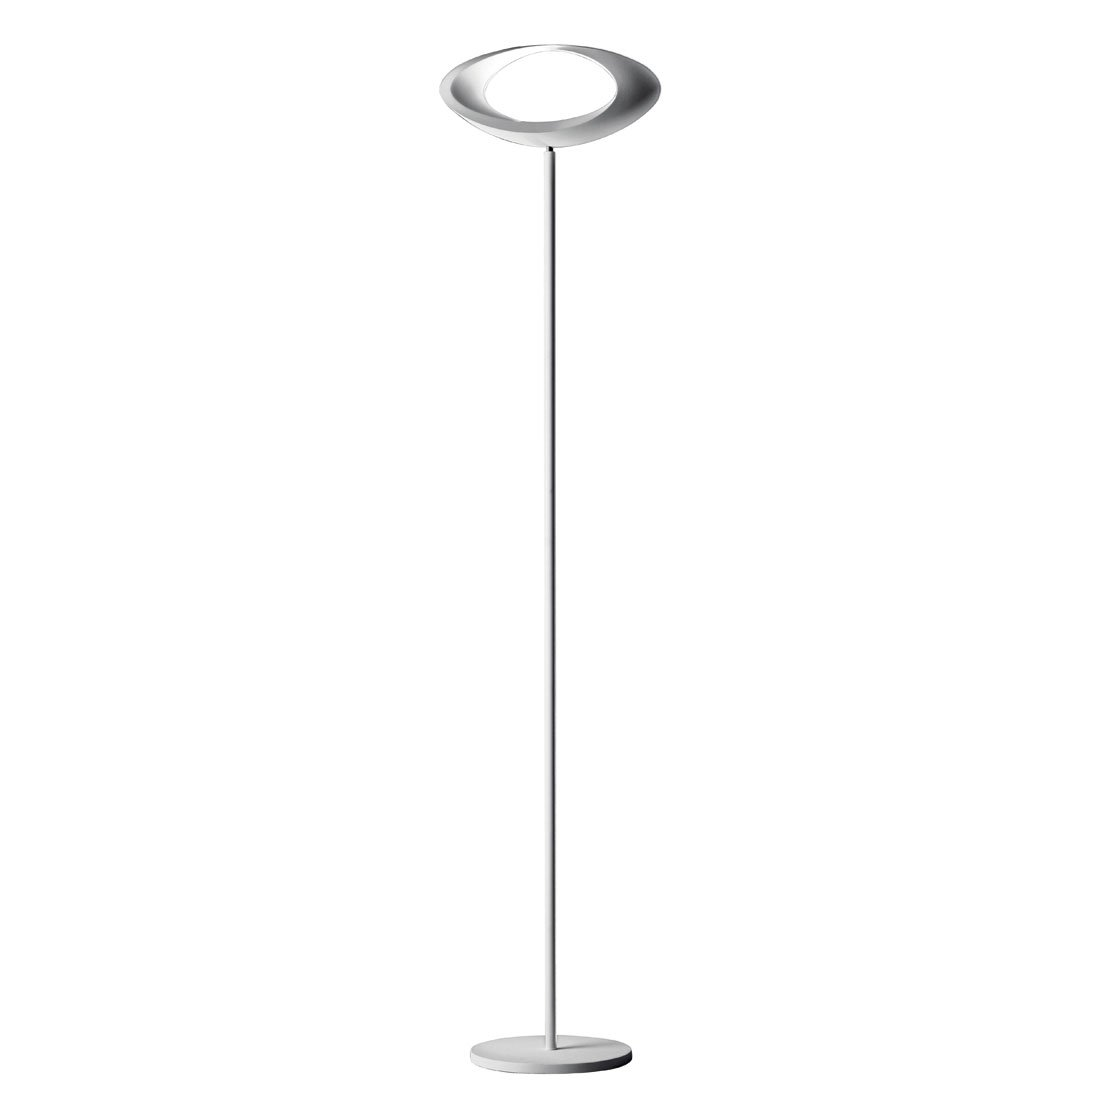 Artemide Cabildo Vloerlamp Wit